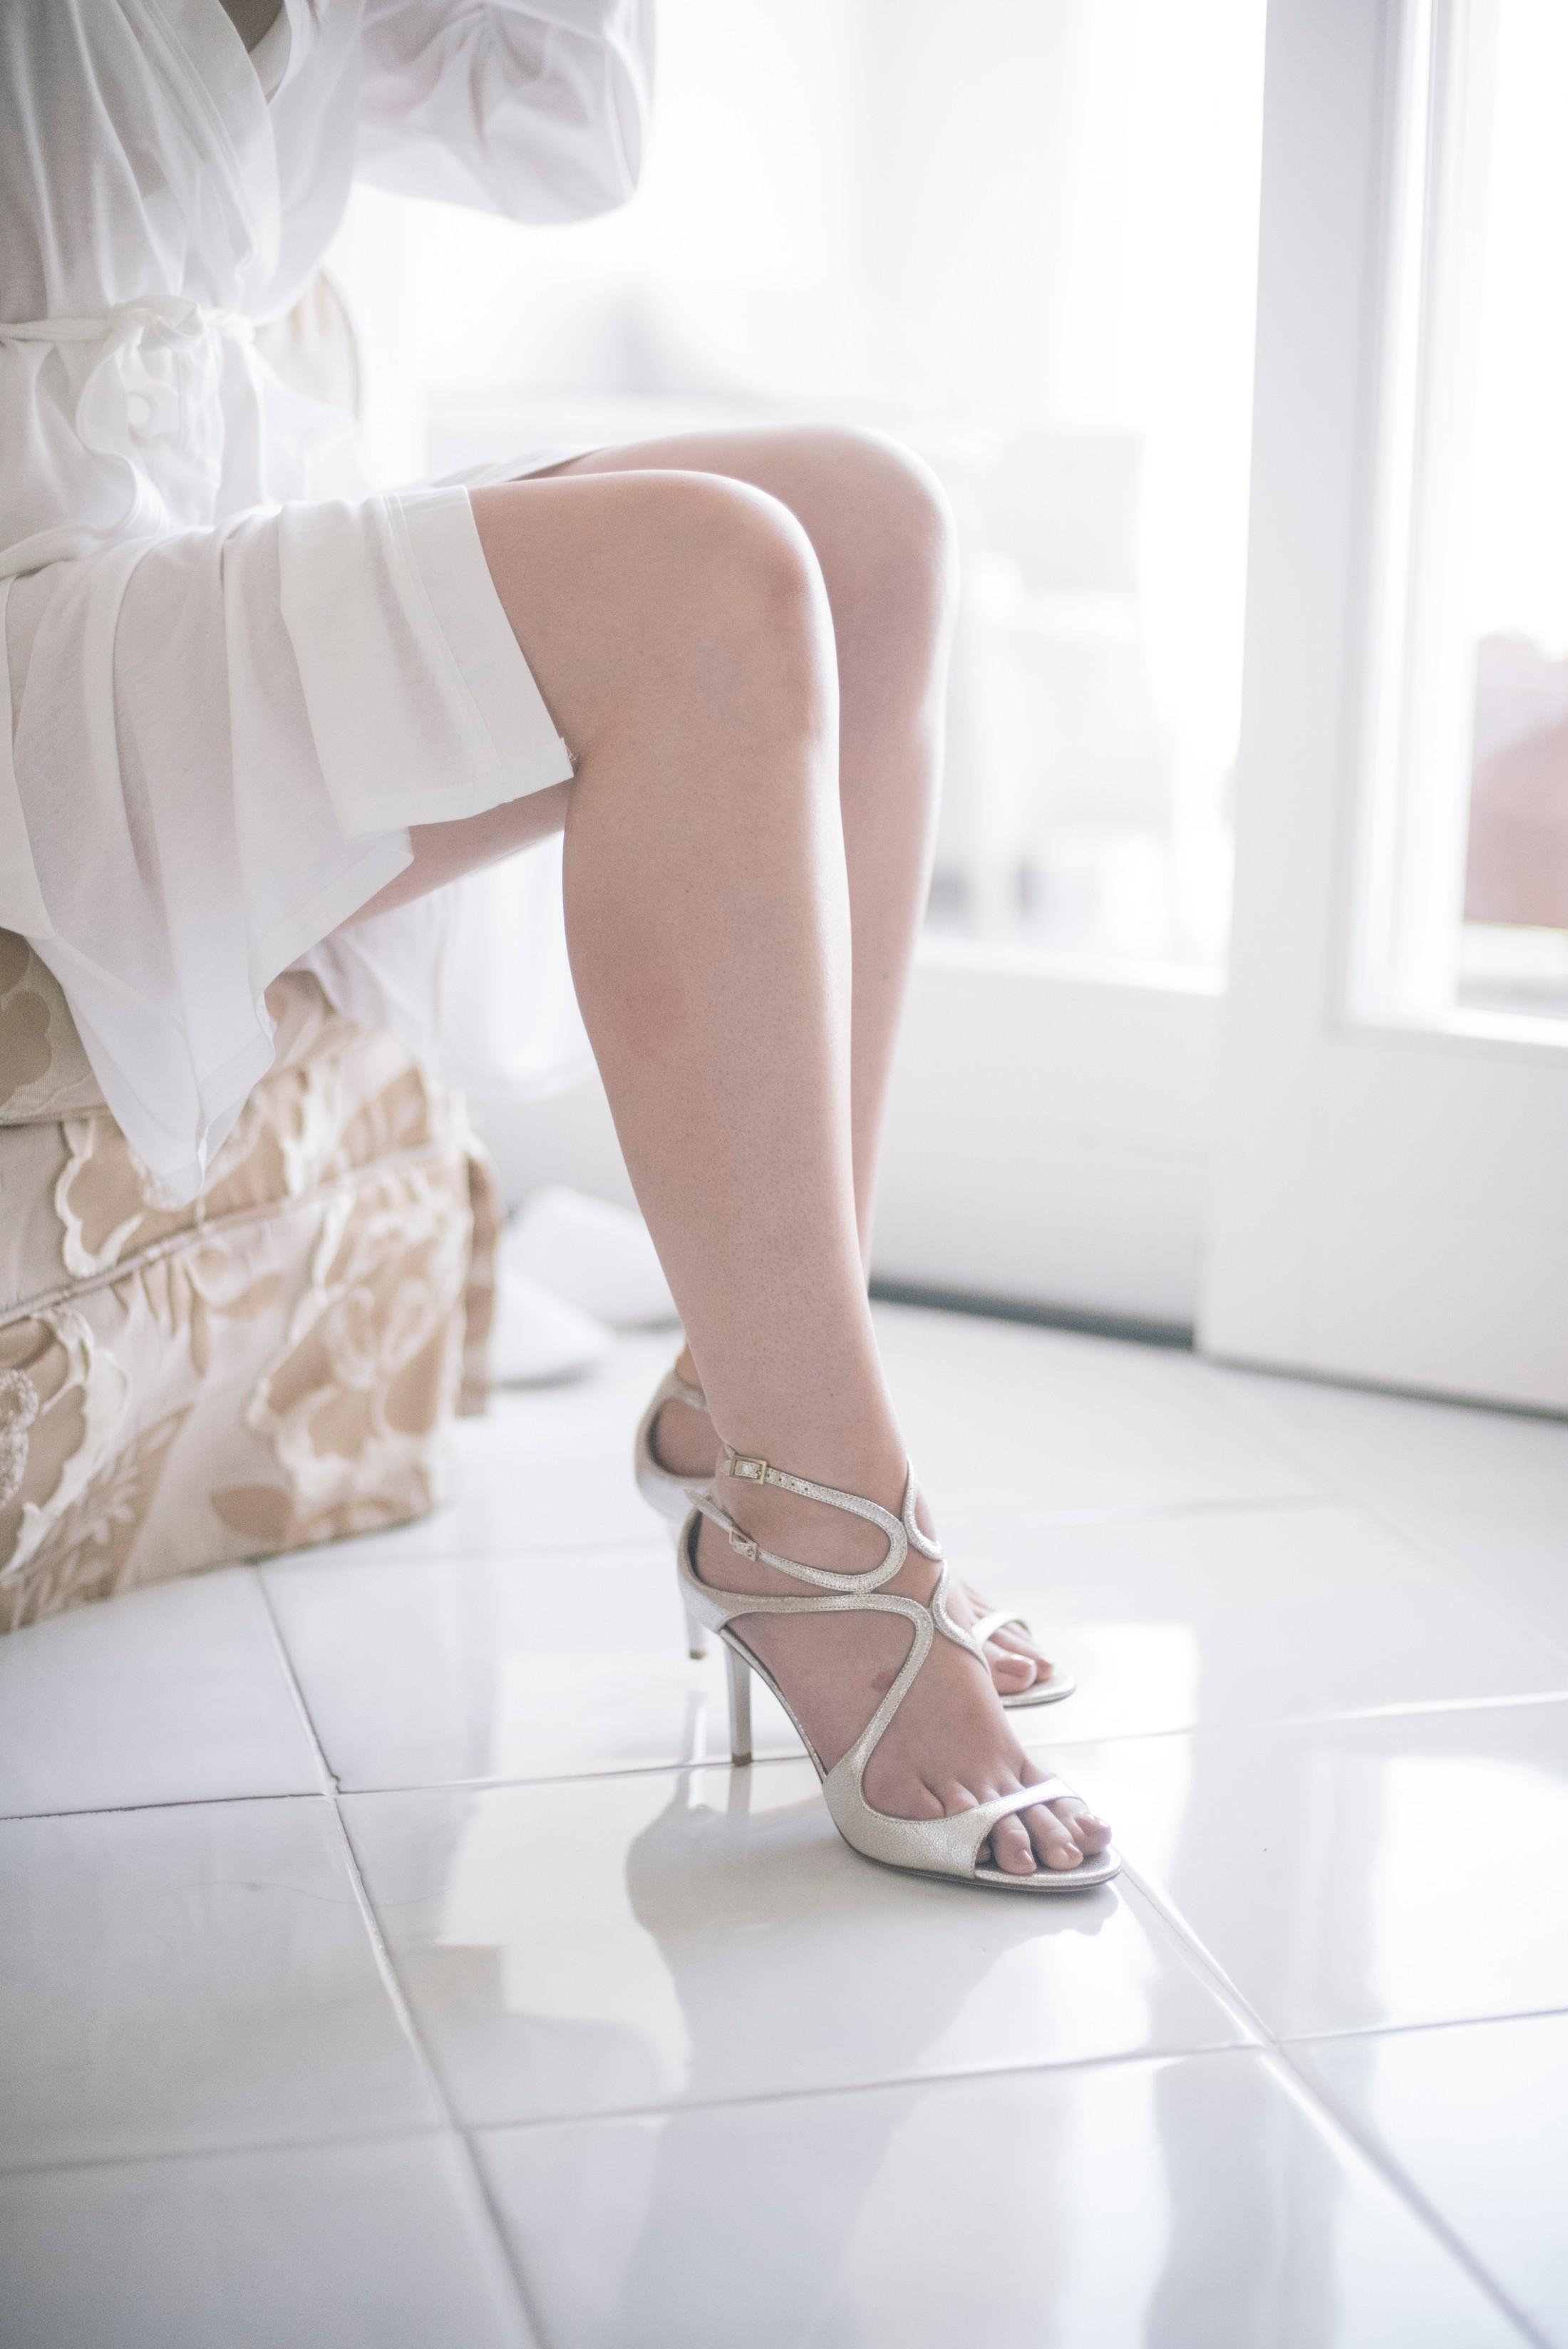 bride's feet